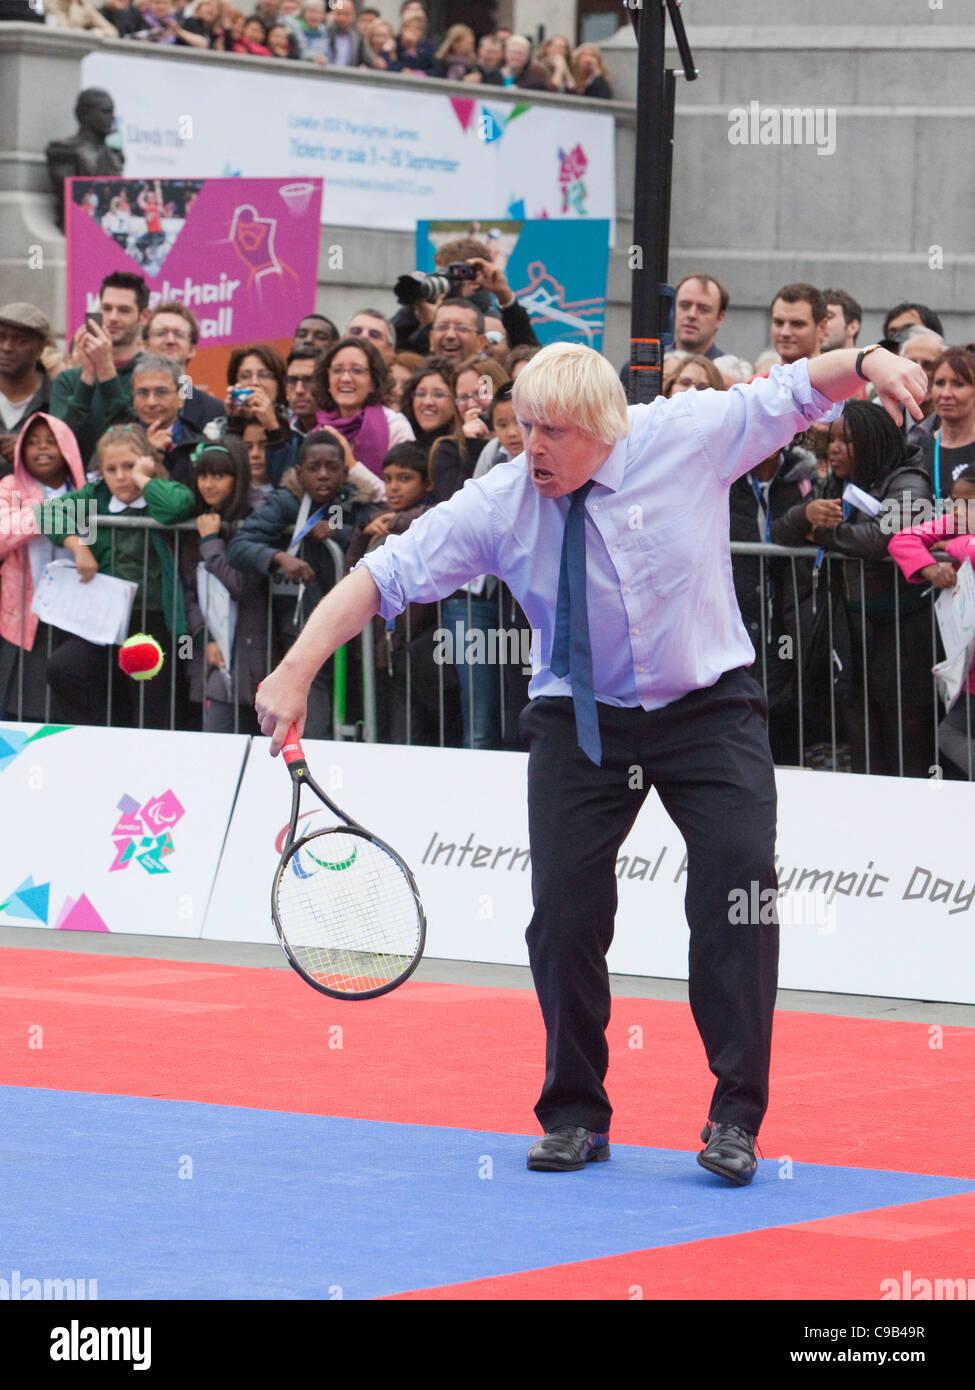 Boris Johnson juega partido de tenis contra PM David Cameron en Trafalgar Square en día Paralímpico Internacional. Foto de stock